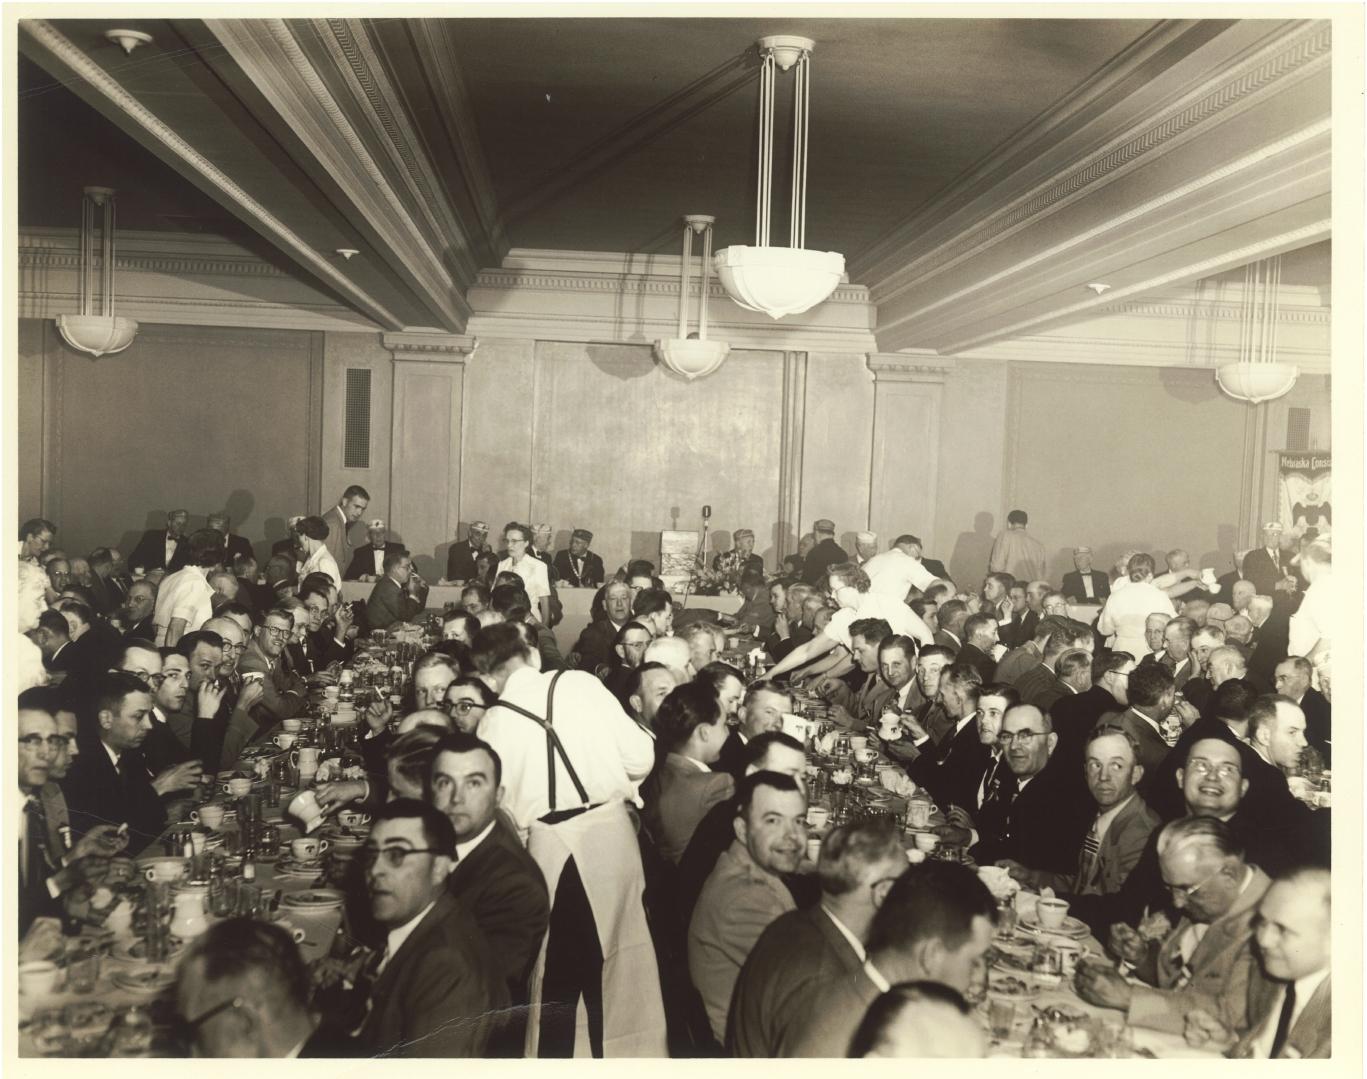 Scottish Rite banquet, c. 1960s